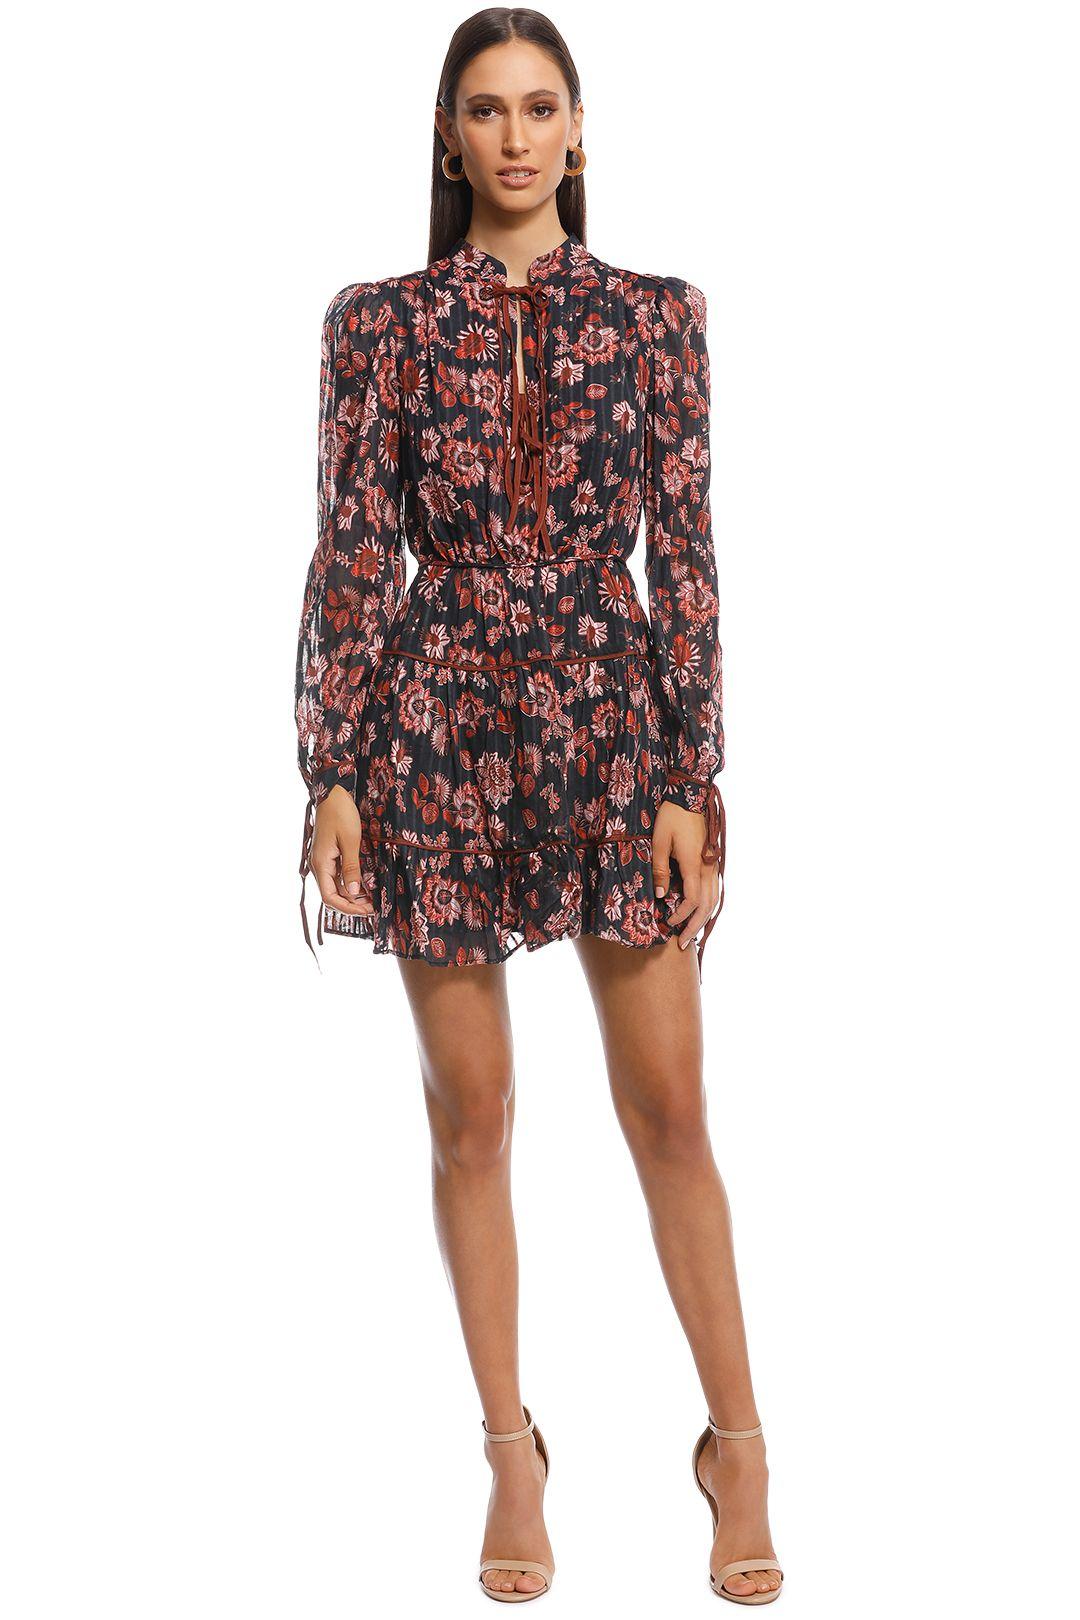 Stevie May - Dakota Mini Dress - Print - Front